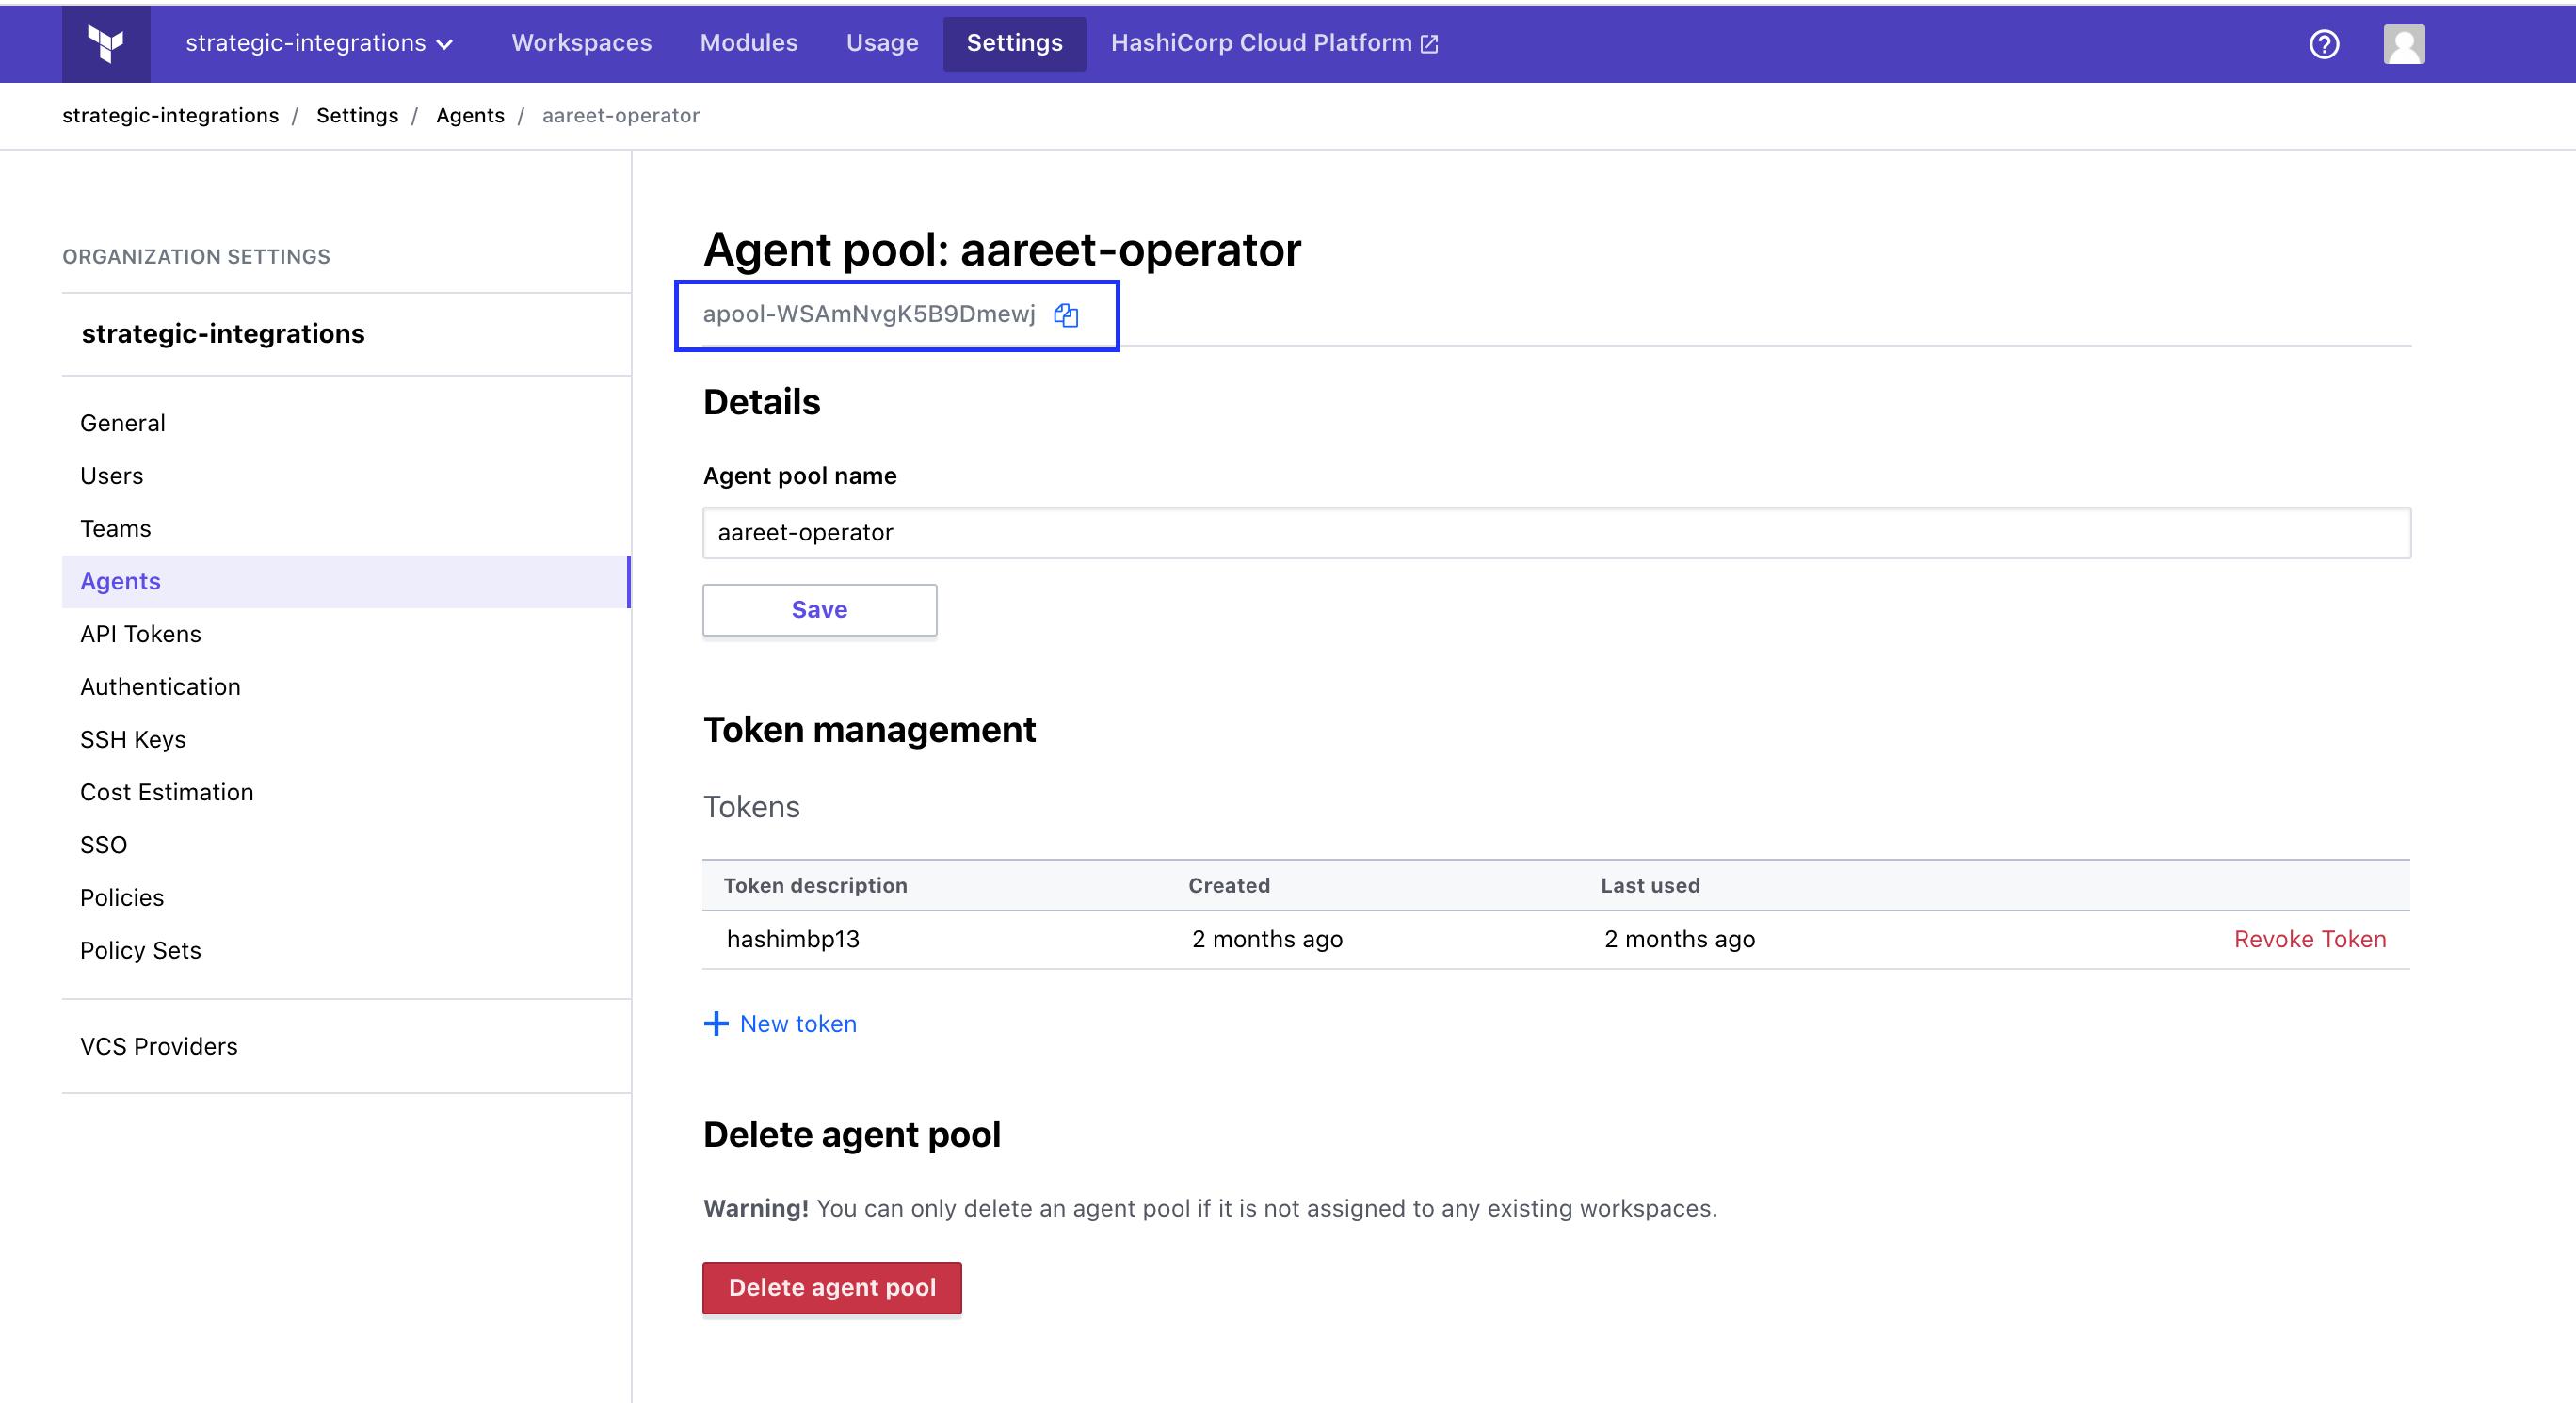 Agent pool details